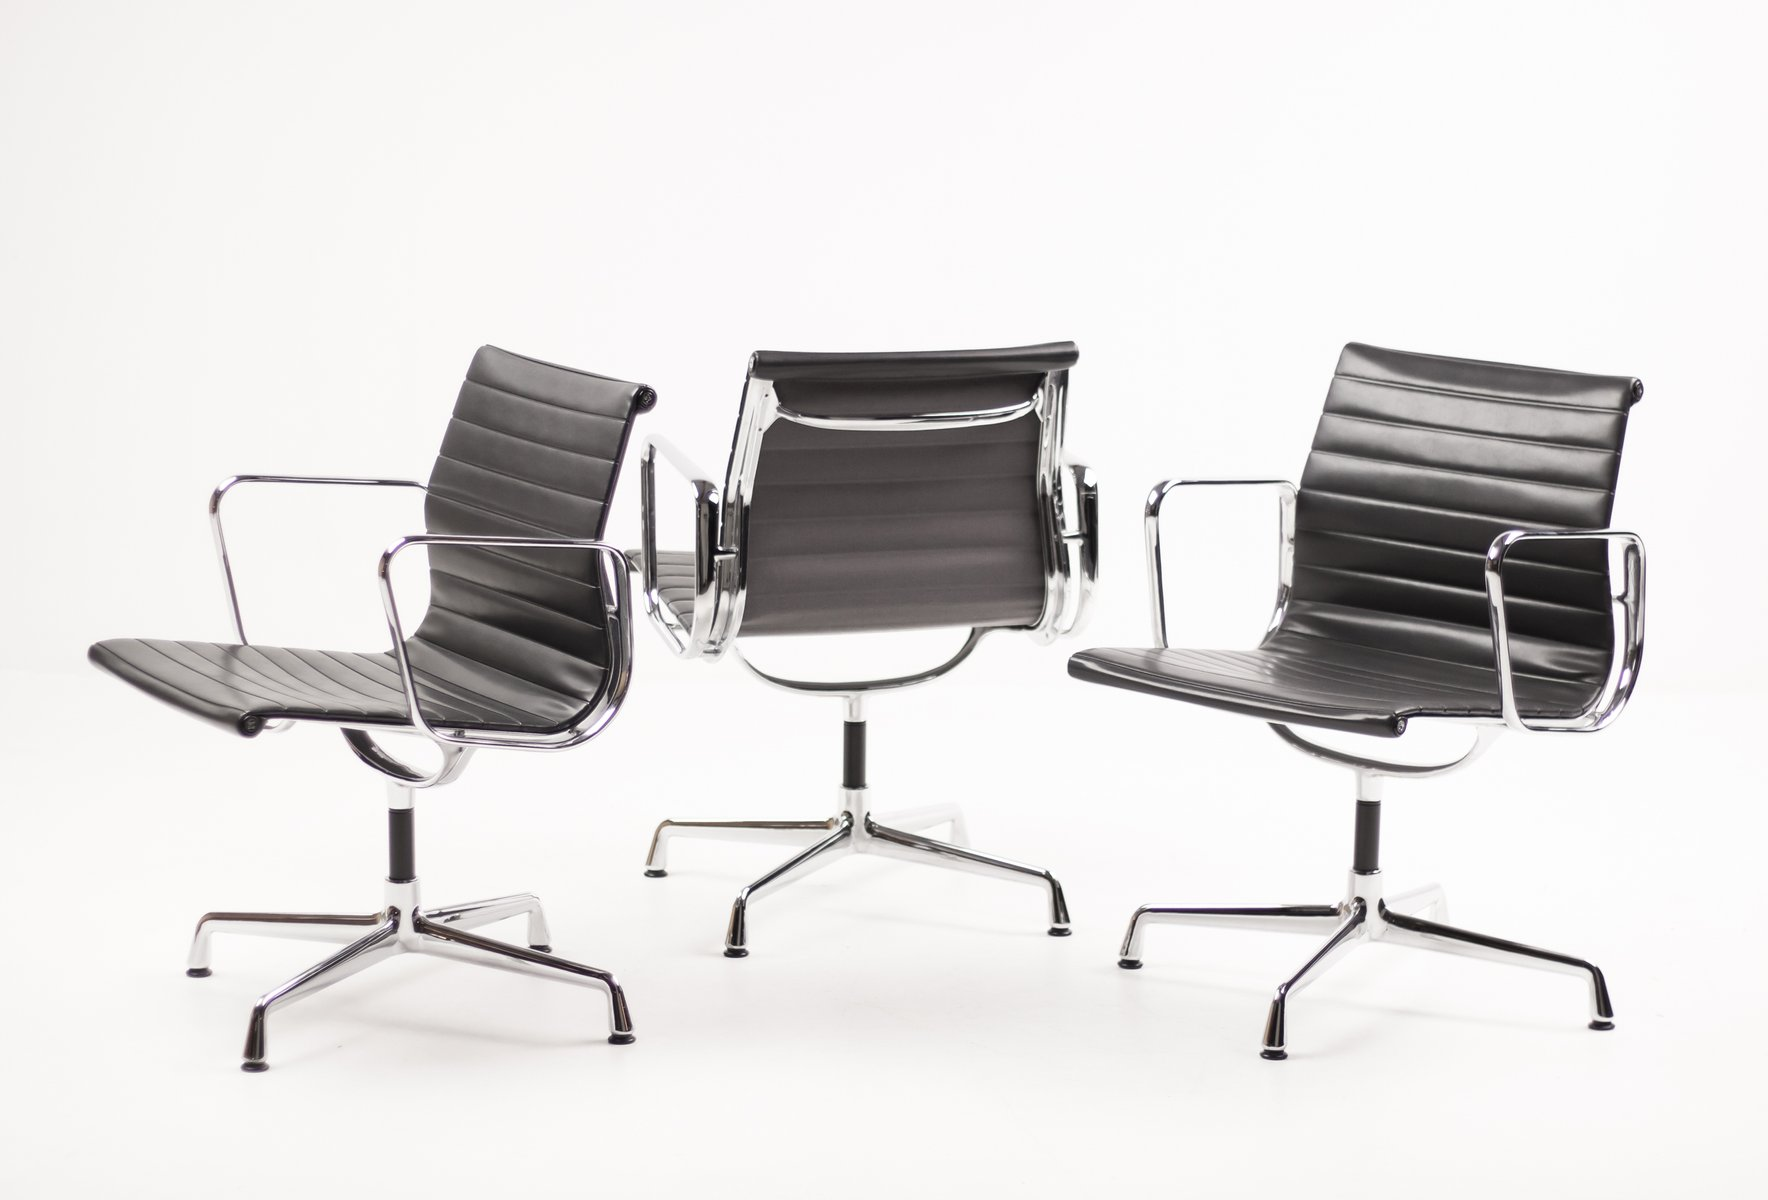 Sedie Charles Eames Vitra.Poltrona Charles Eames Vitra Eames Lounge Chair Wikipedia Vitra